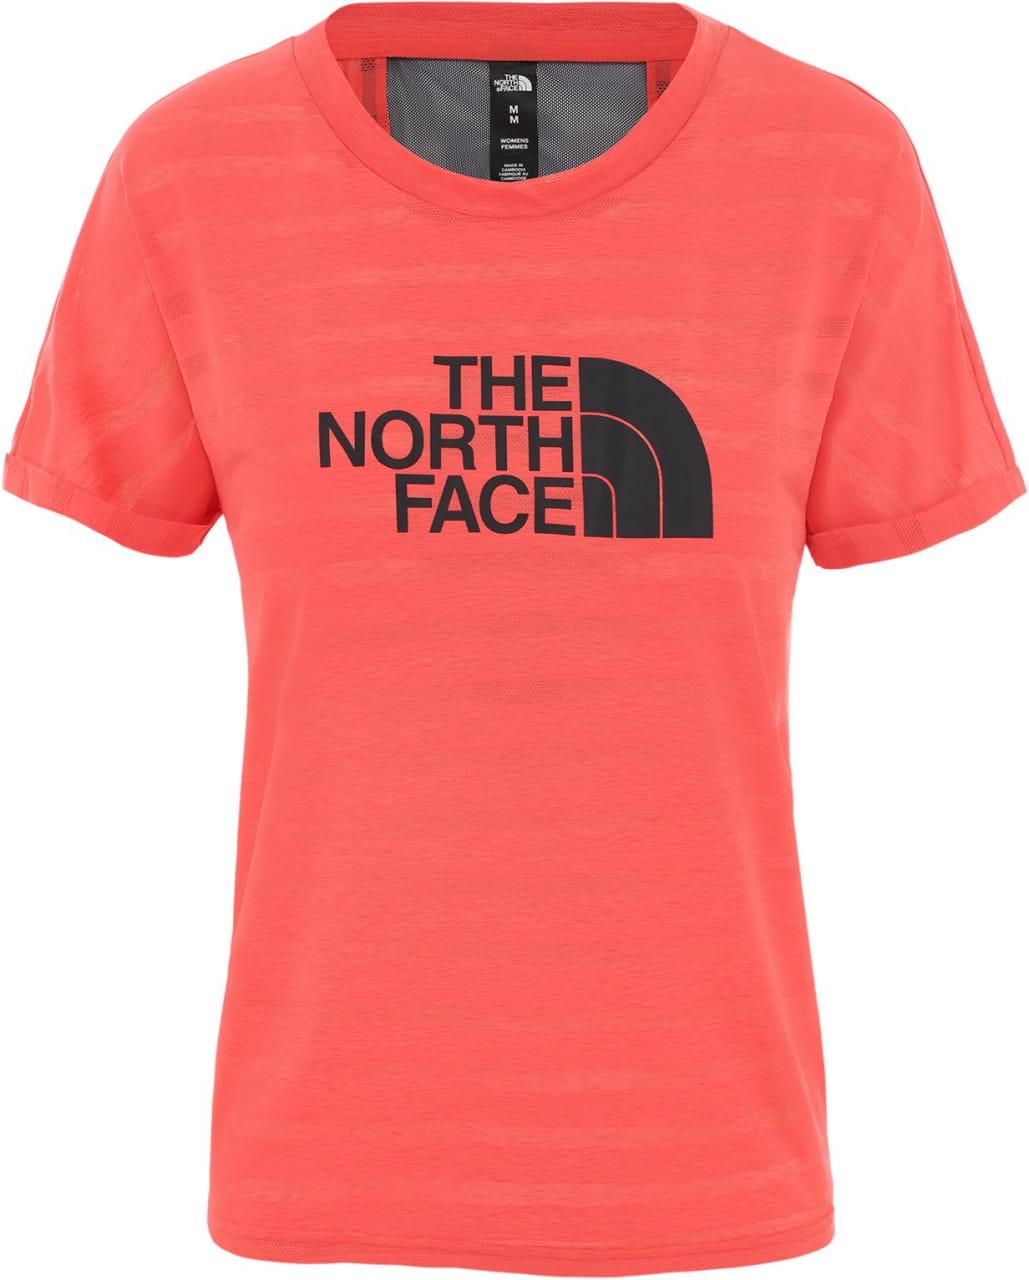 Dámské tričko The North Face Women's Varuna T-Shirt